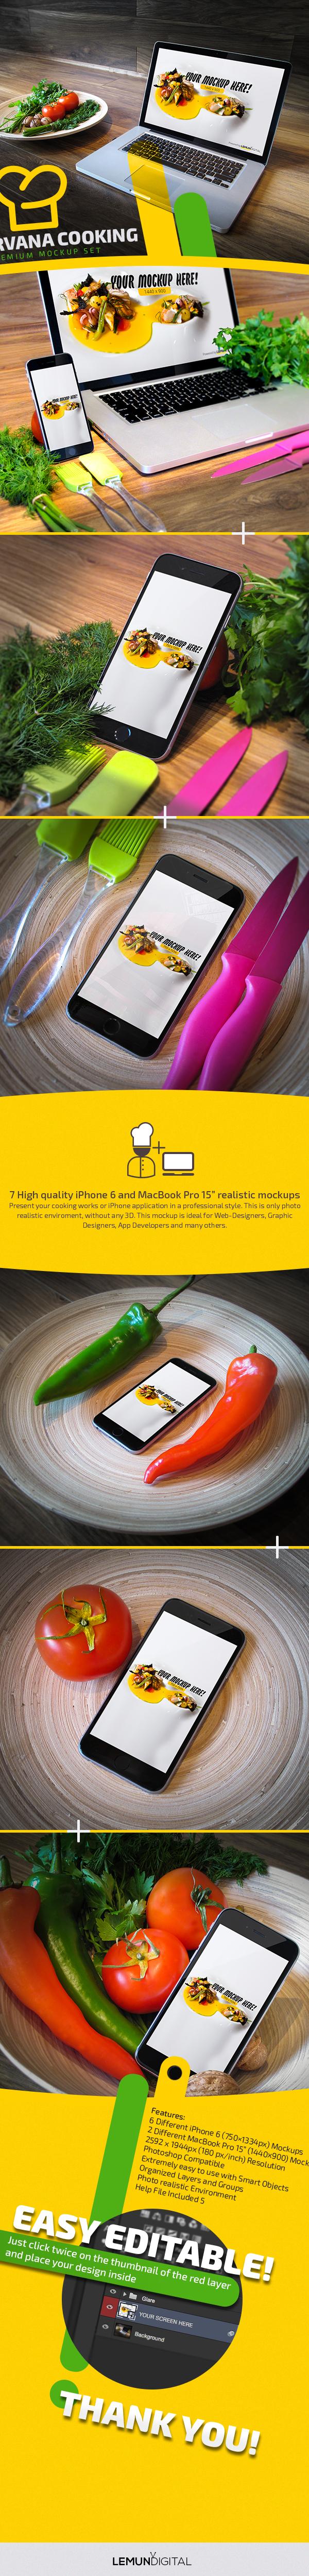 iphone 6 macbook apple Mockup mockups cooking kitchen vegetables fresh lemun digital Tomato green mock-up nirvana